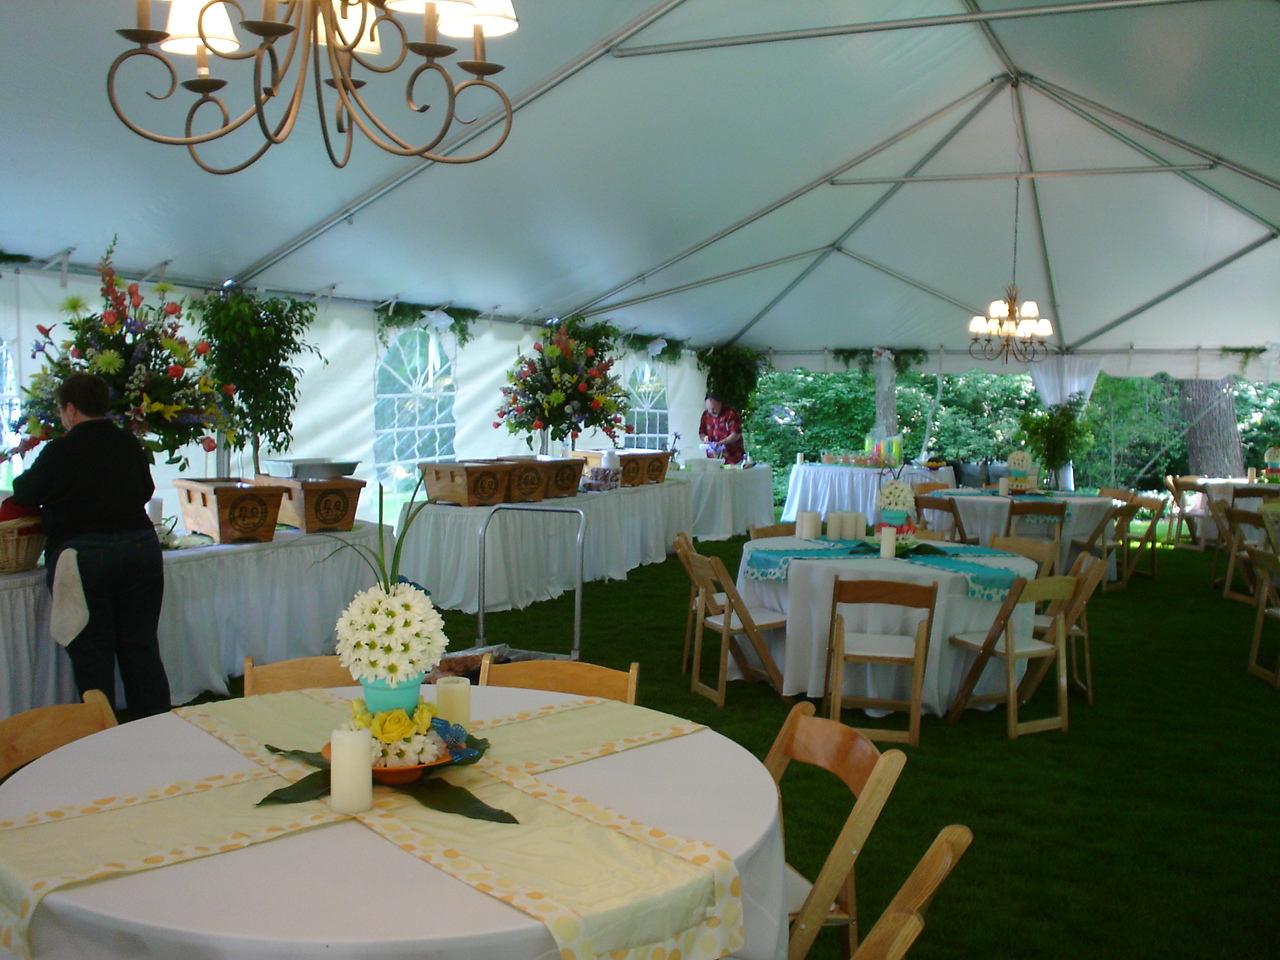 Tents-Unlimited Party Rental-Dallas, Marietta, Rome GA